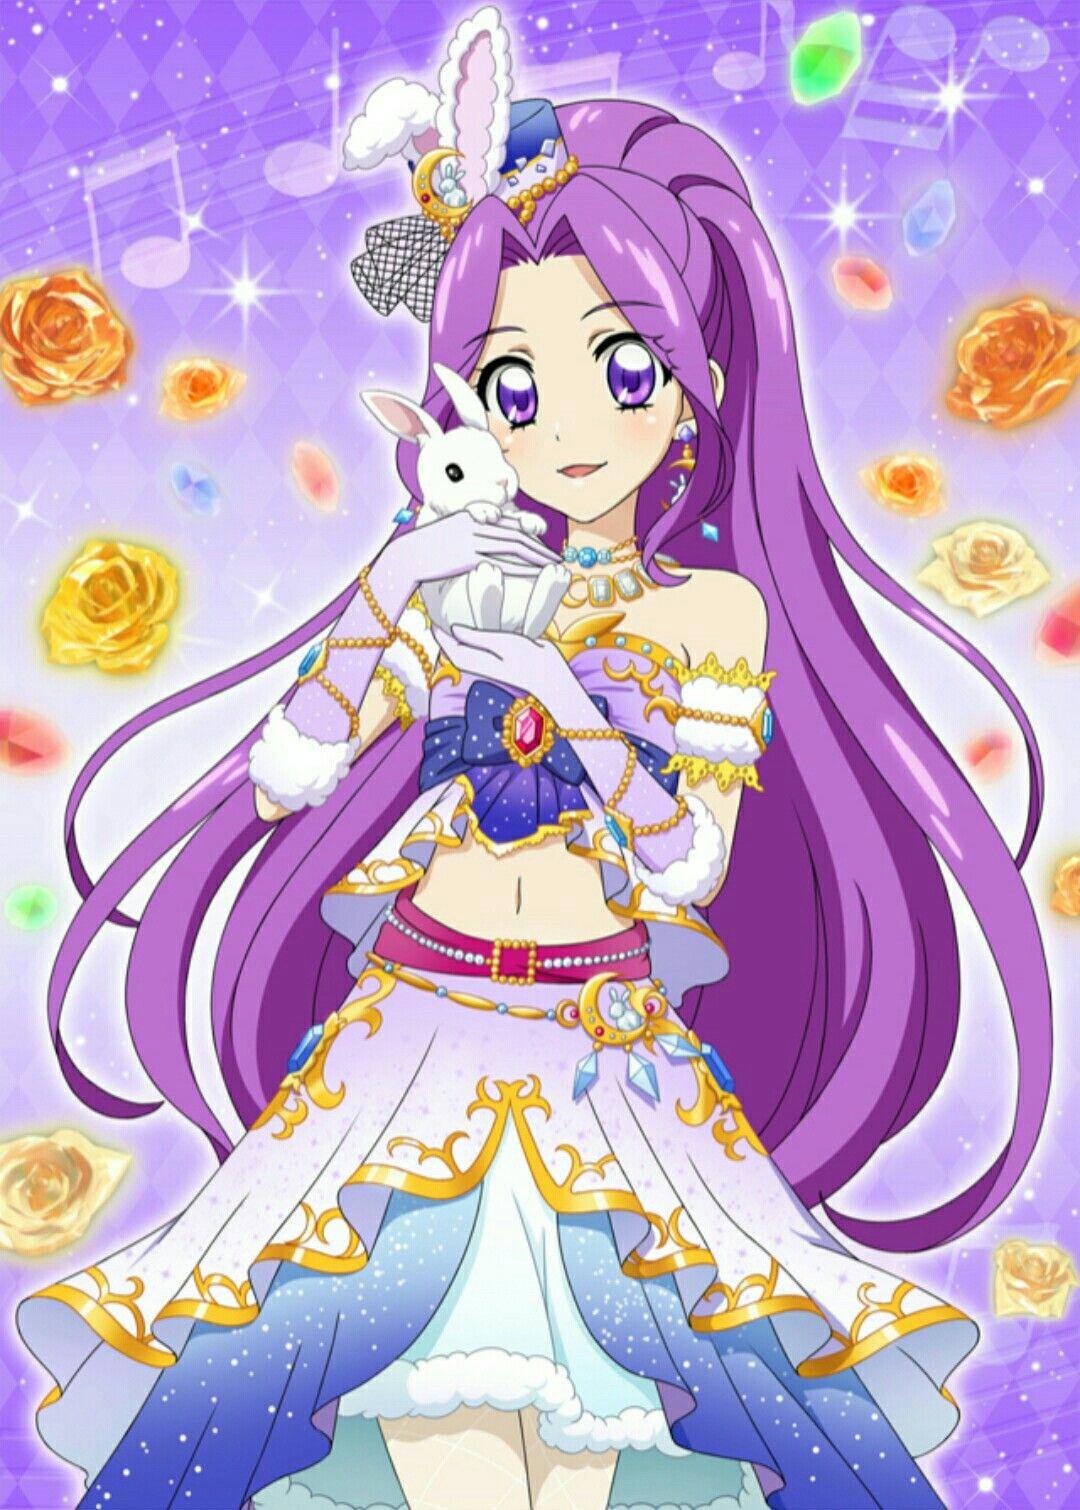 Mizuki Sr15 Chang Trai Anime Co Gai Phim Hoạt Hinh Anime